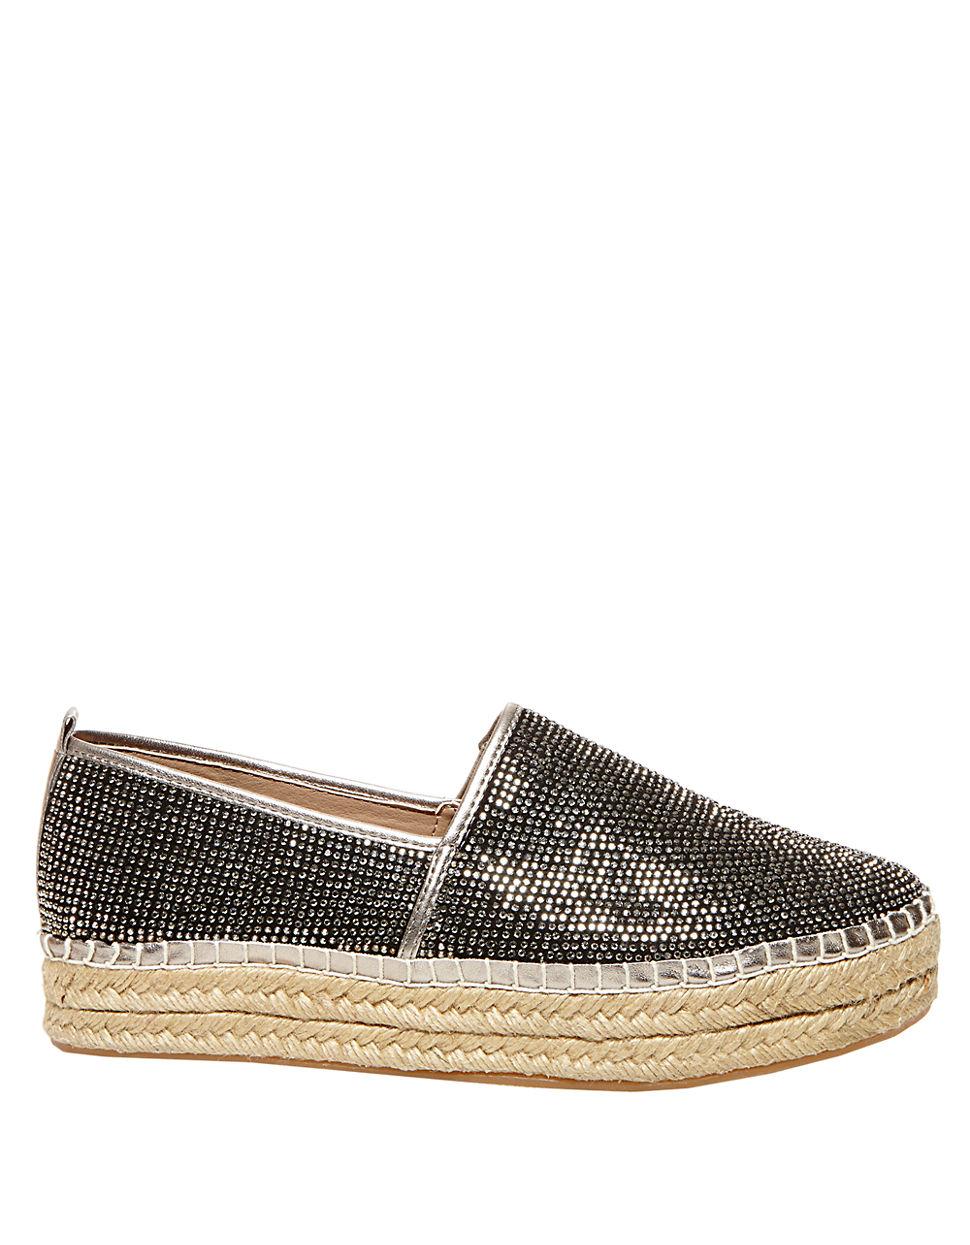 1e00242bb3ff Steve Madden Chopur-r Rhinestone Embelllished Slip-on Sneakers in ...